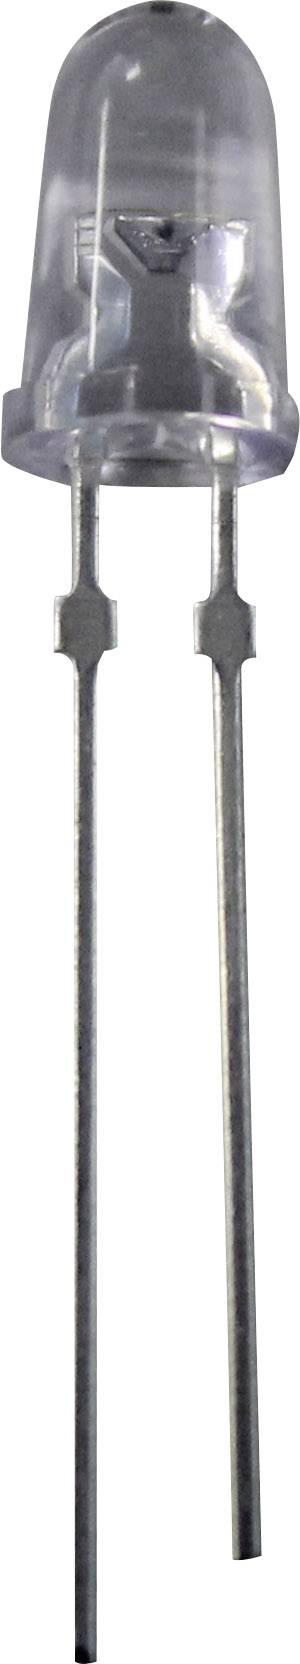 LED dioda kulatá s vývody Nichia, 20 mA, 5 mm, 3,2 V, 15 °, 37700 mcd, zelená, NSPG500S